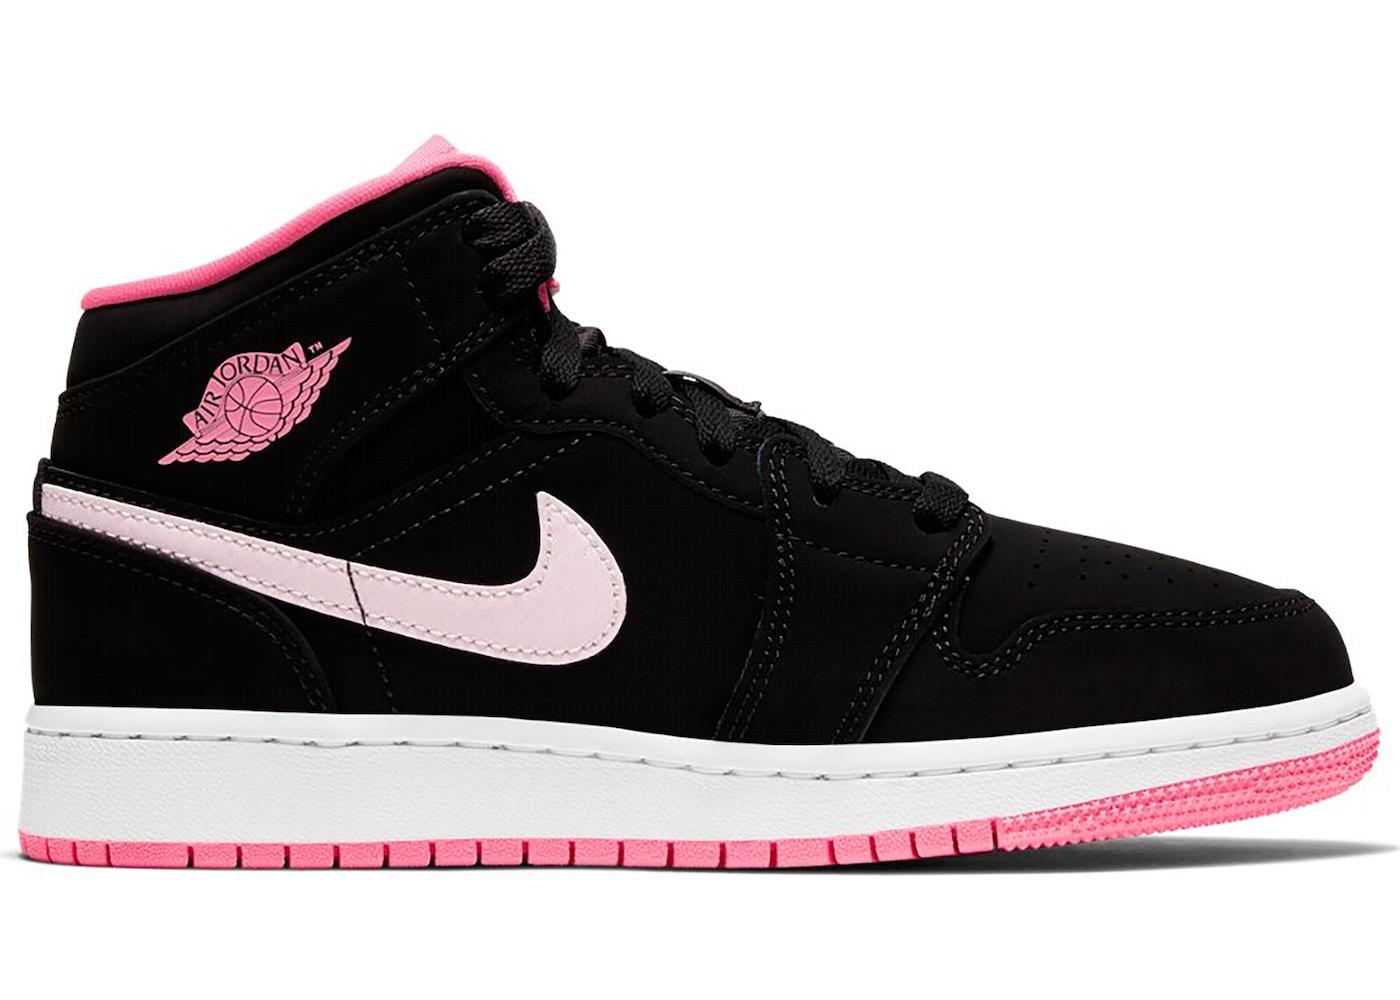 Jordan 1 Mid Black Digital Pink Gs 555112 066